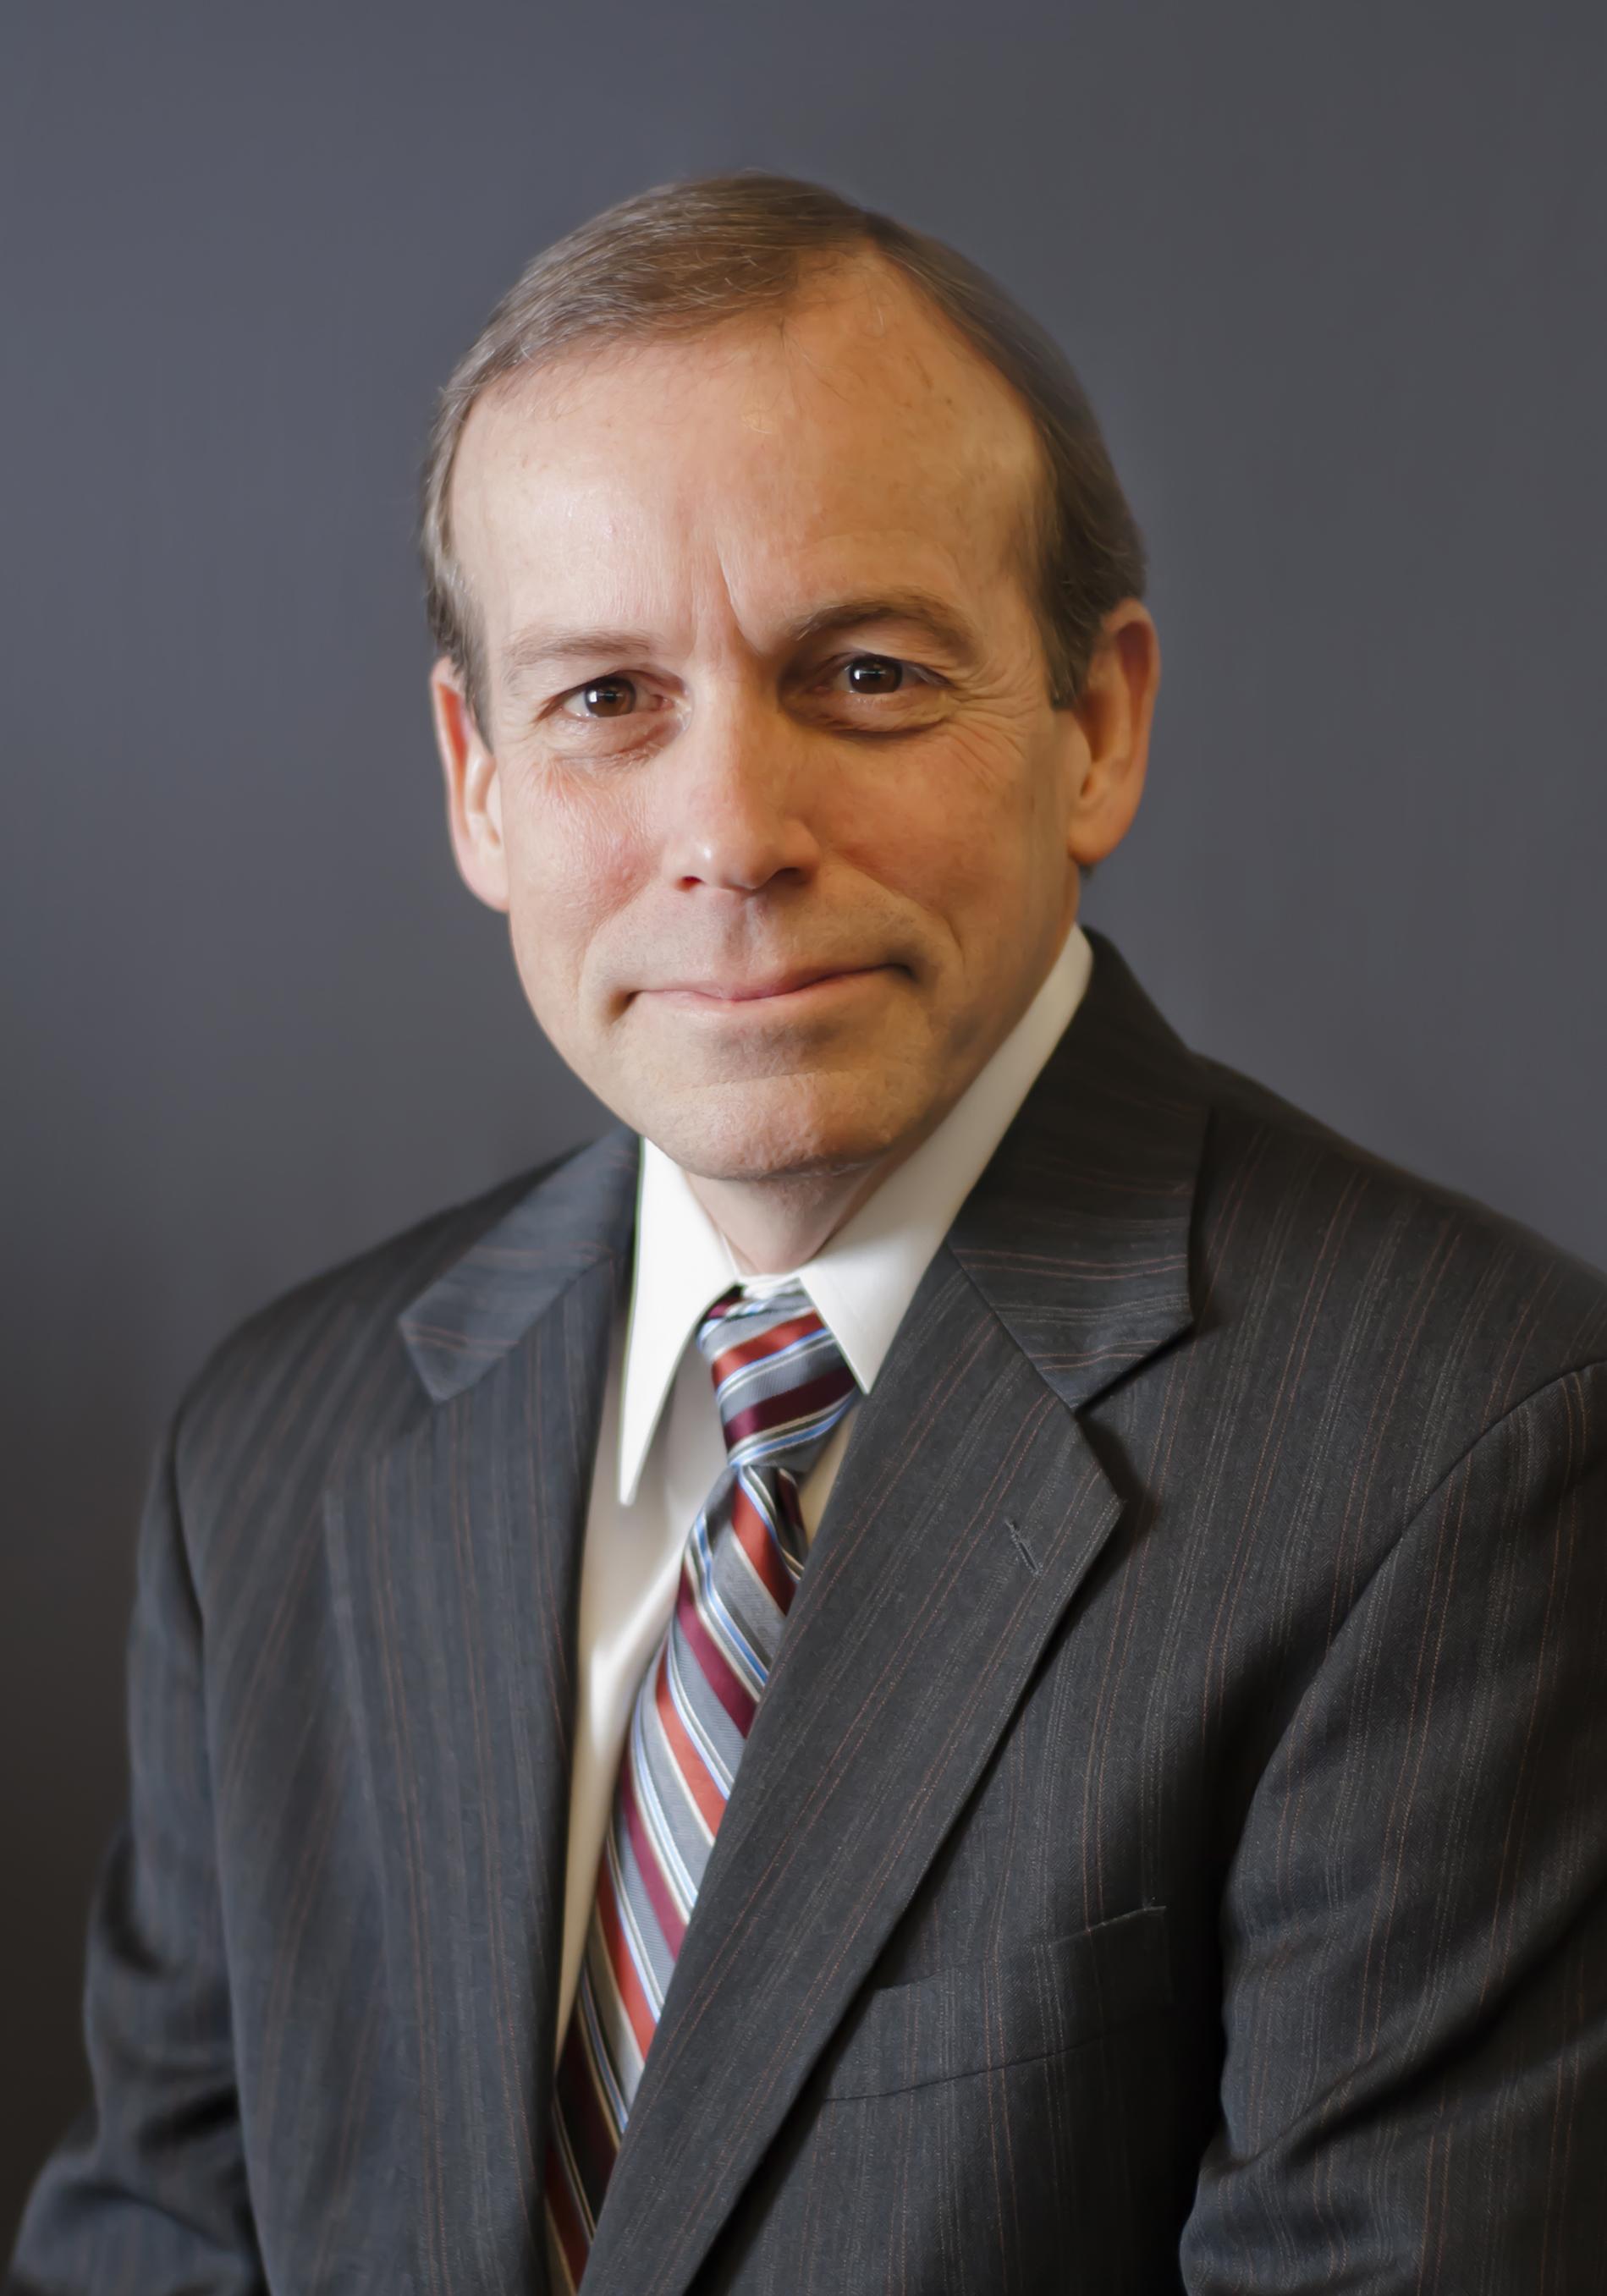 Dave Scott, SVP of Operations, Erdman